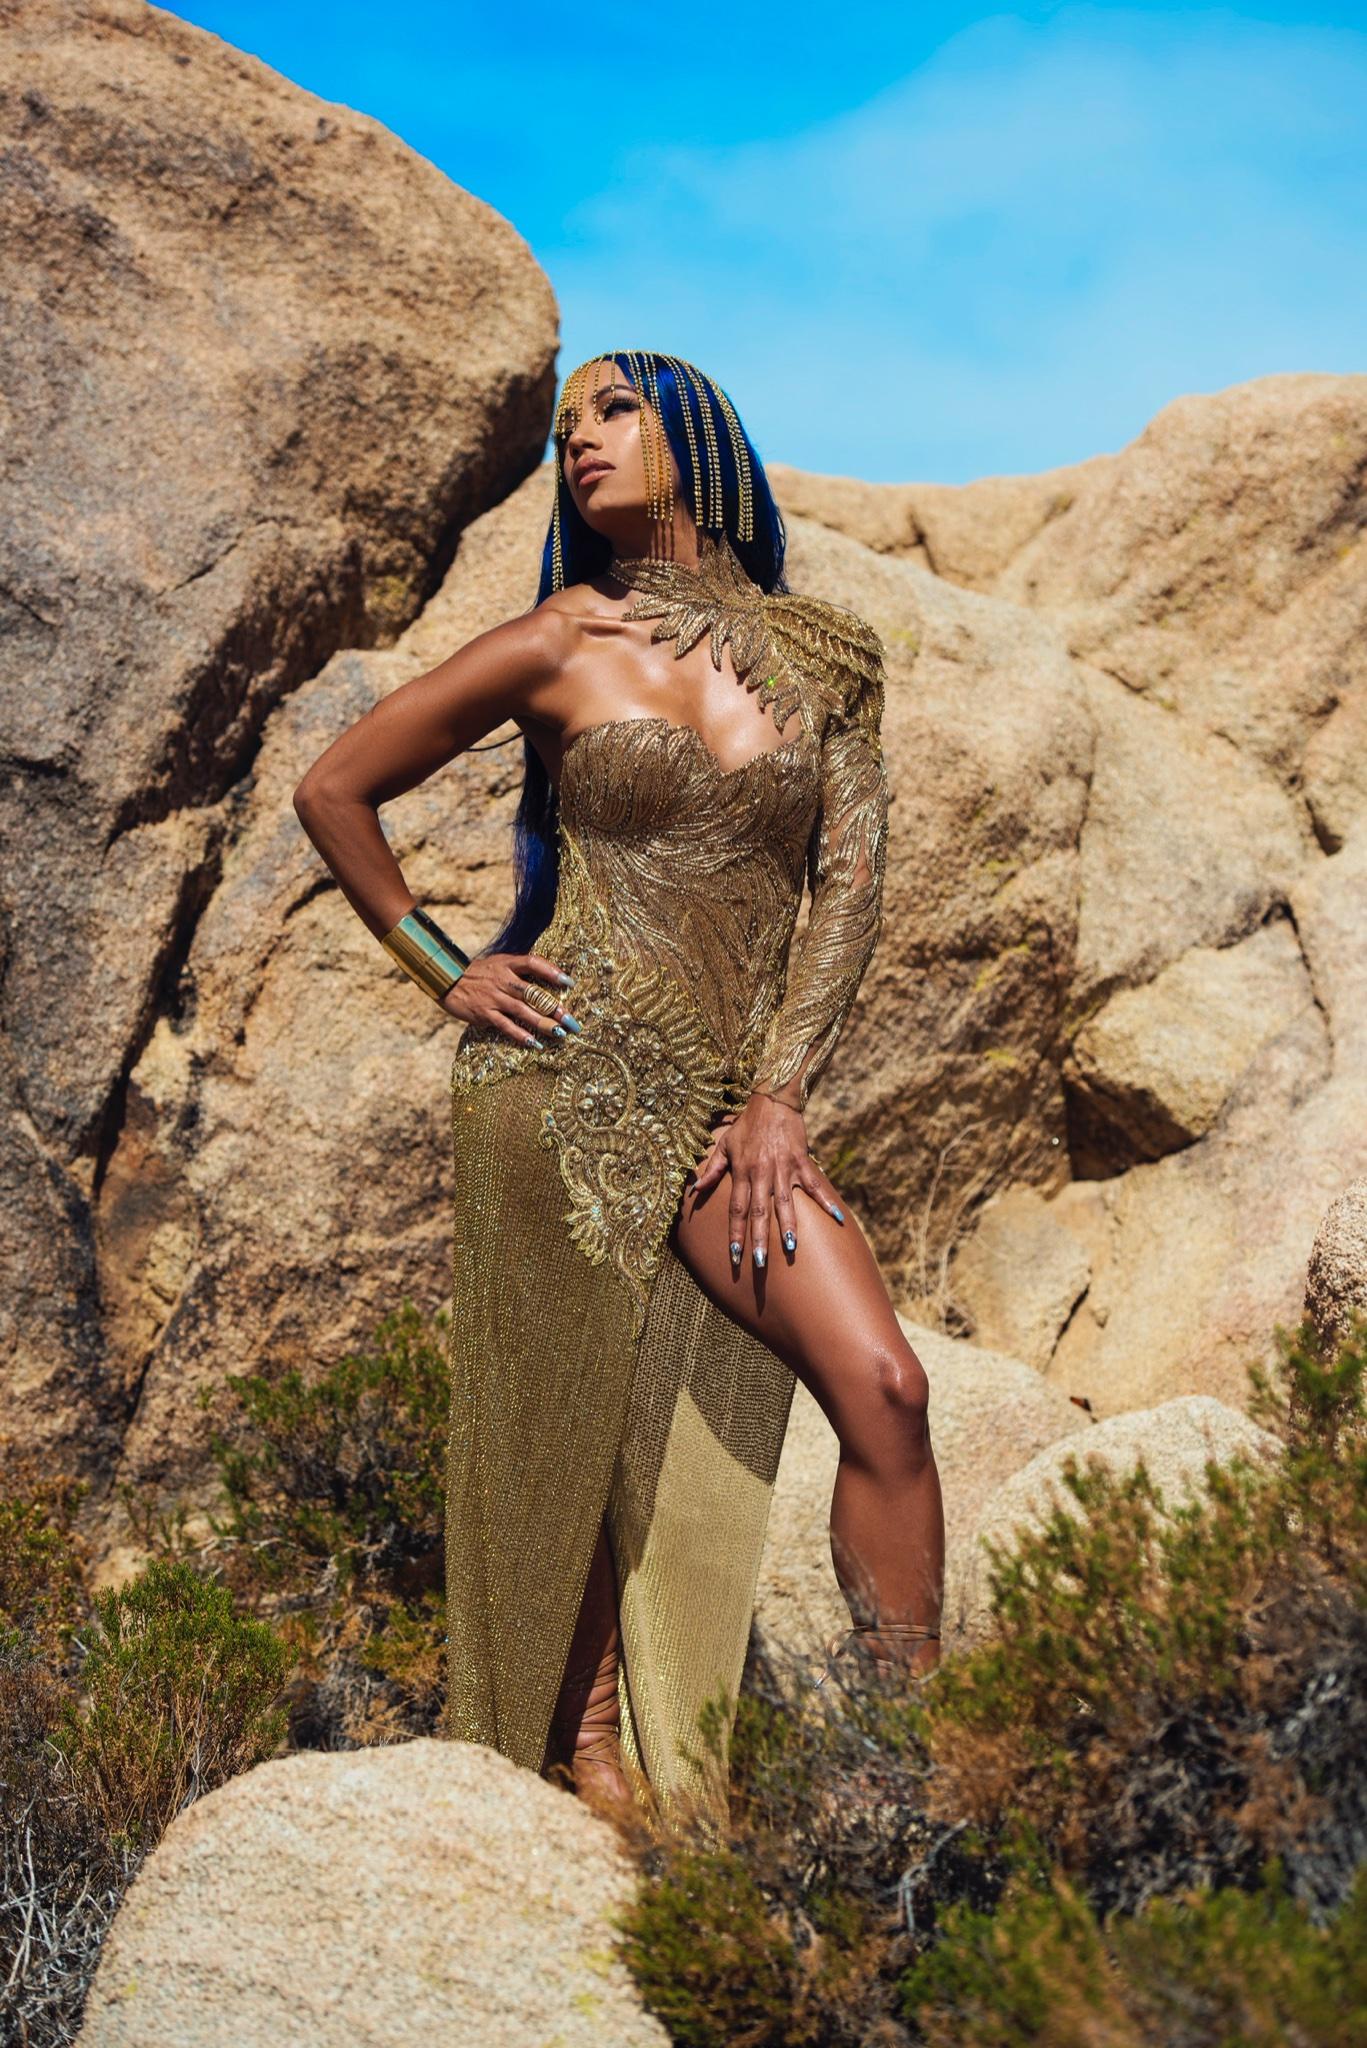 Photos: WWE Star Sasha Banks Presents Herself As An Archangel In Golden Attire 80